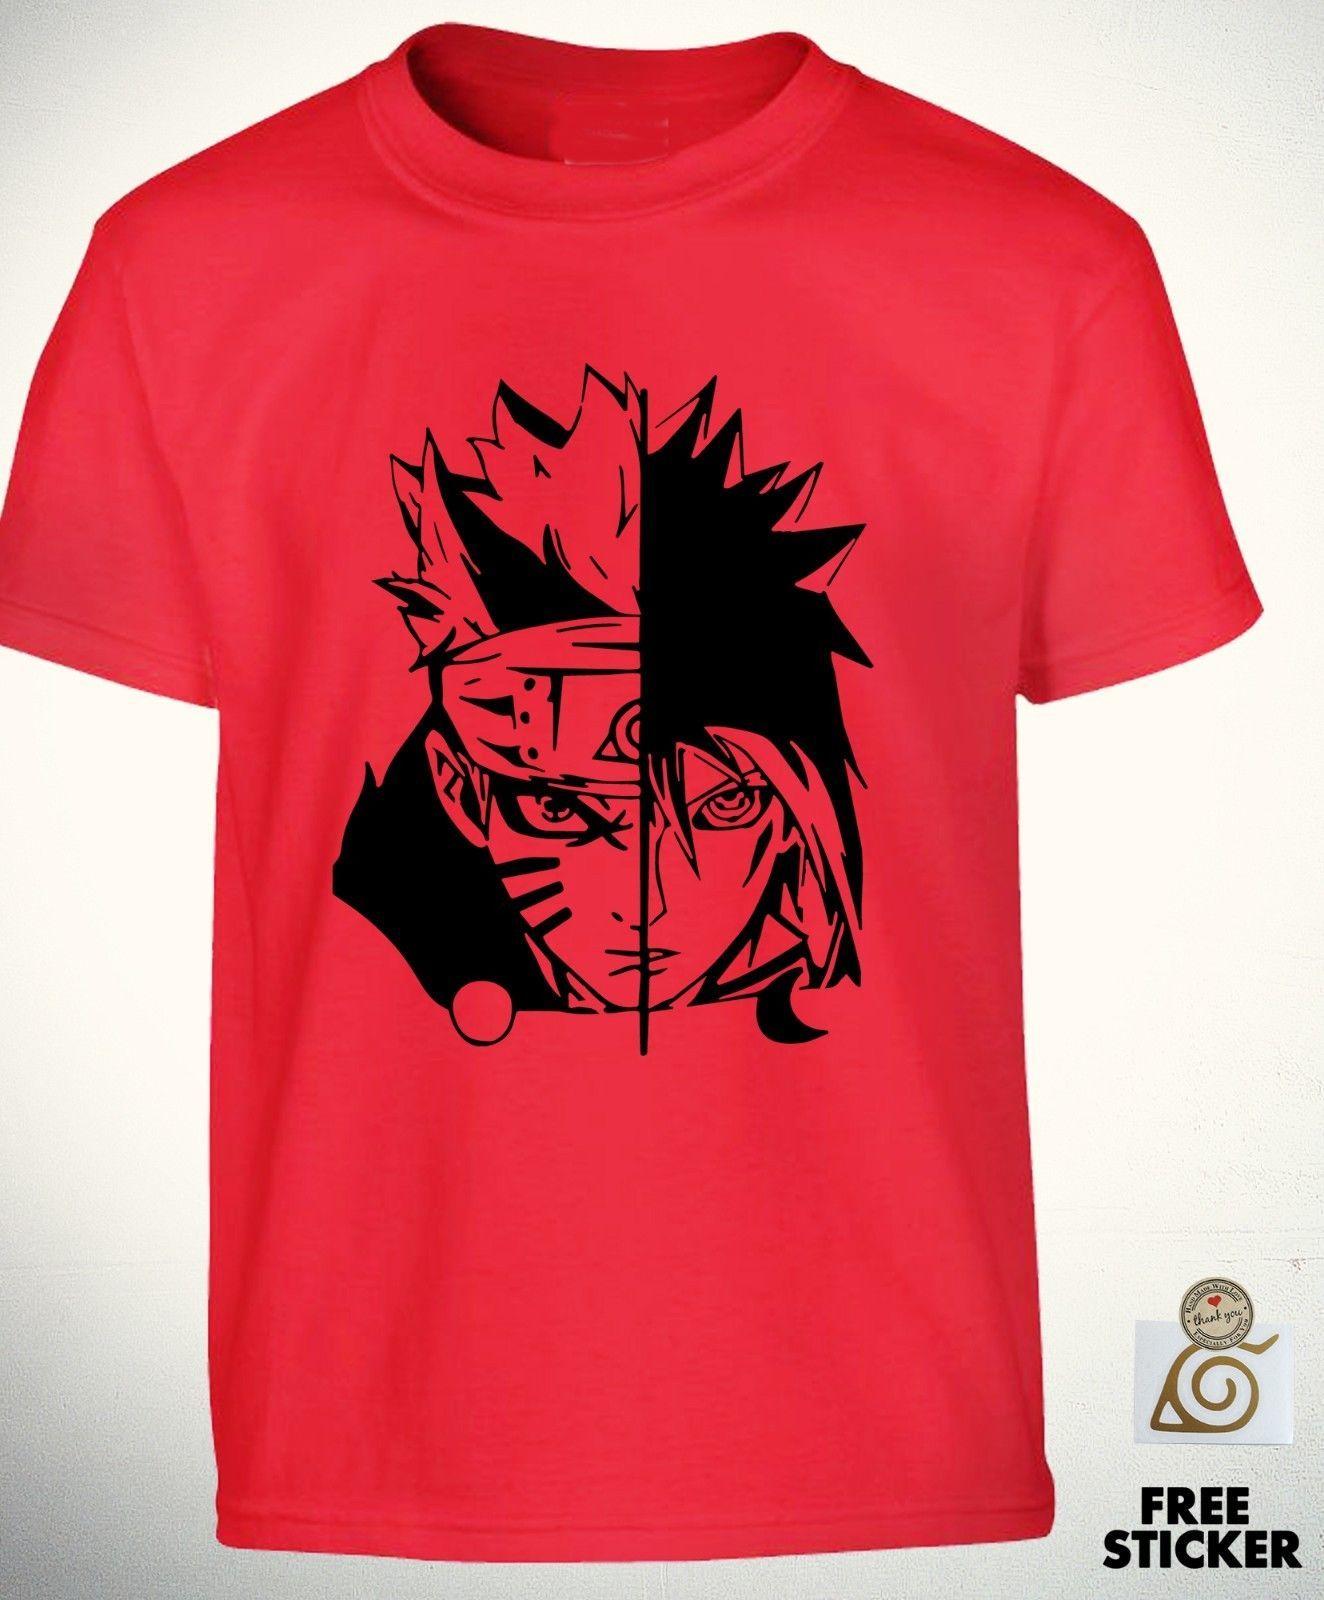 dbb912270 Naruto Vs Sasuke Red T Shirt Uchiha Sharingan Tee Cool Anime Gift Top Boys  Kids Cool T Shirts For Boys Online Cool Team Shirts From Yg06tshirt, ...